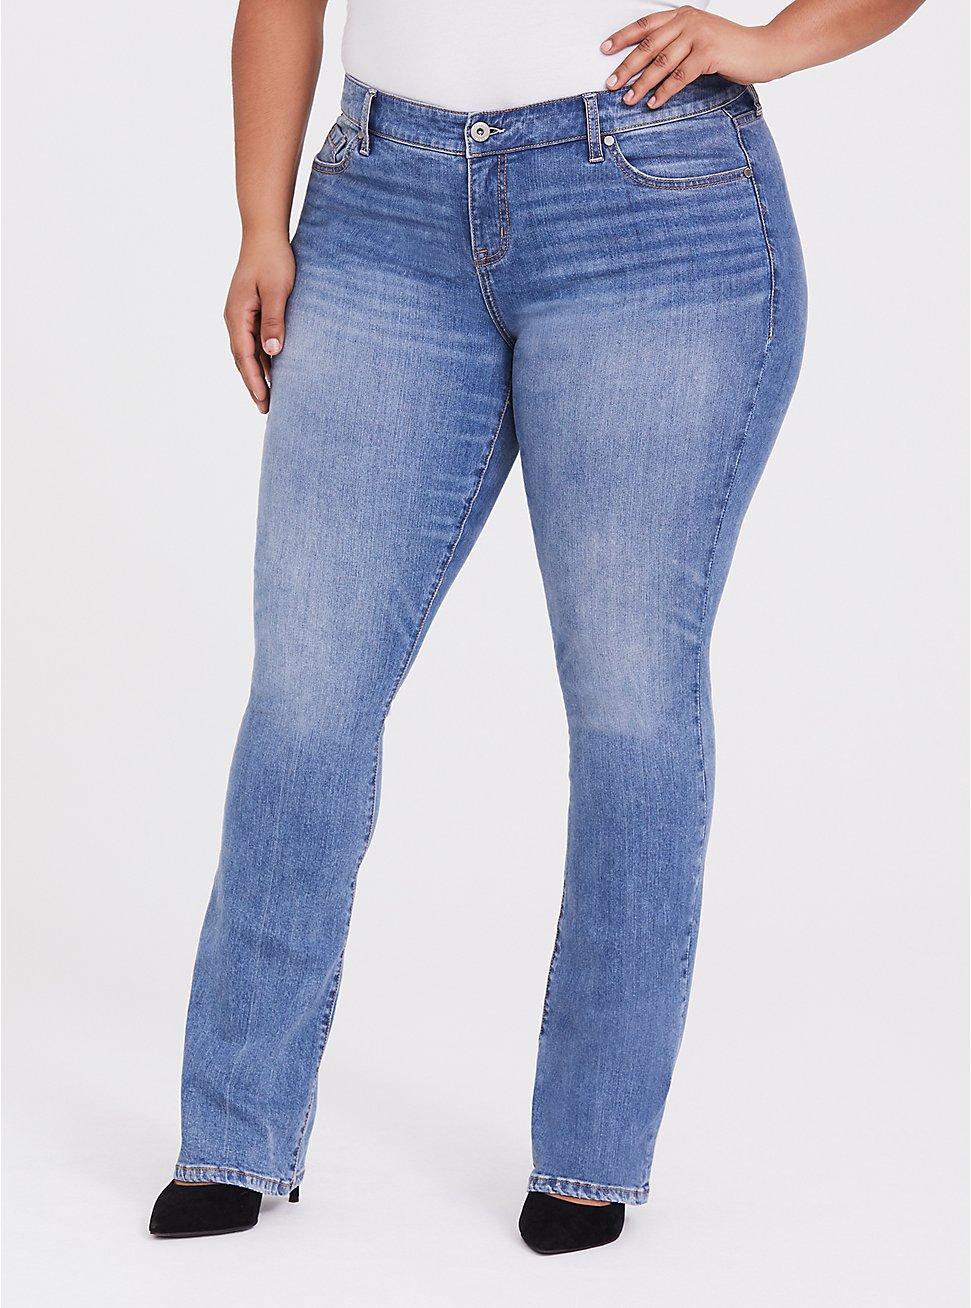 Slim Boot Jean - Vintage Stretch Light Wash, MONTECITO, hi-res